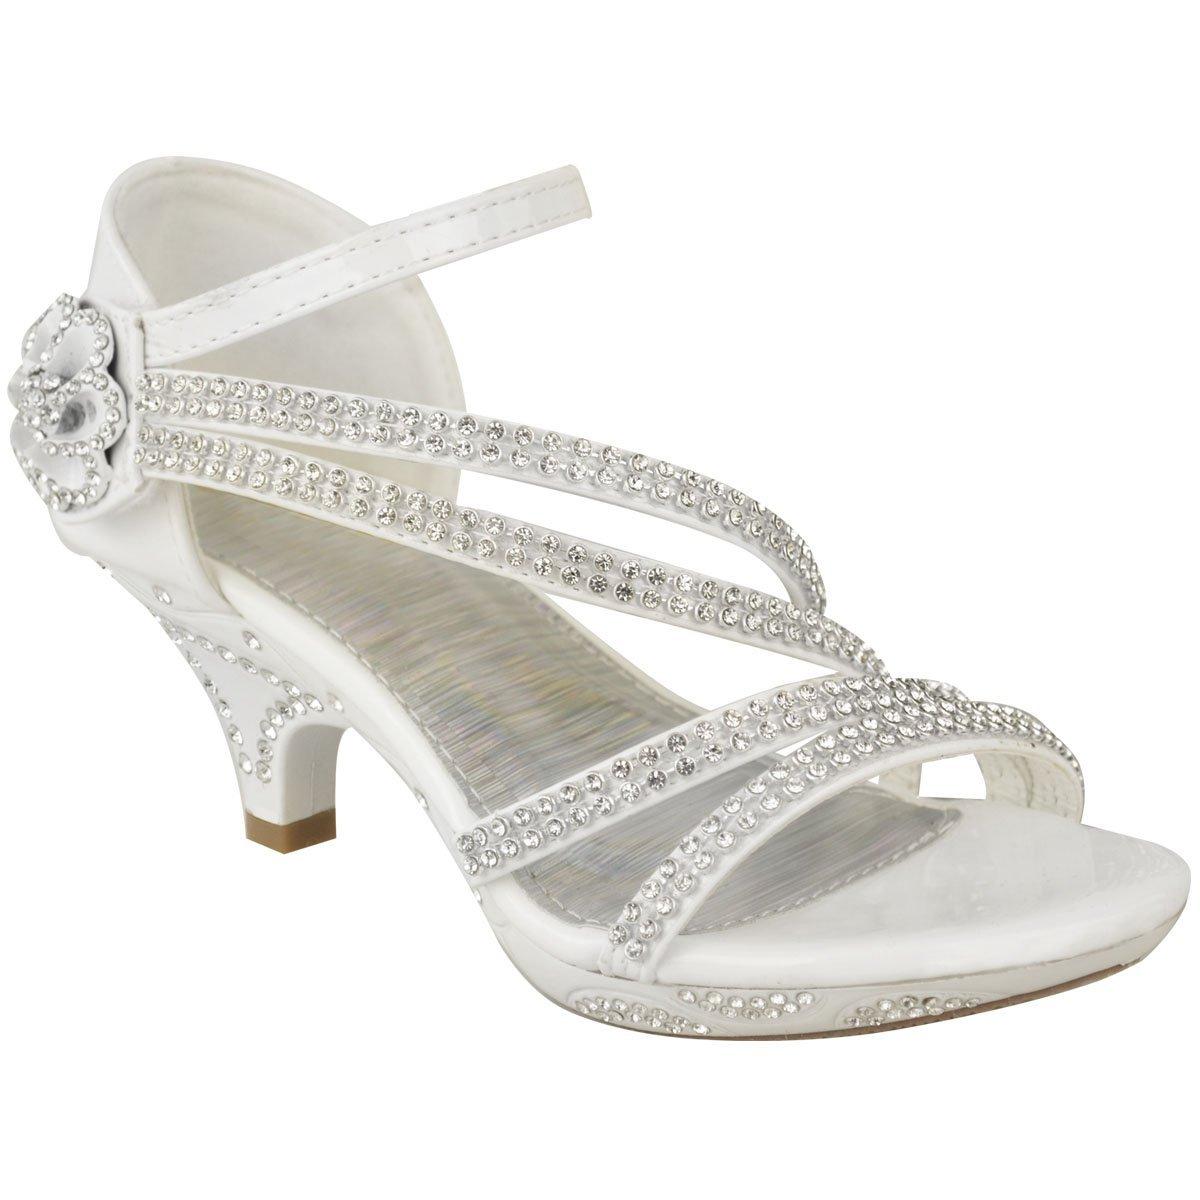 f82c2dd6871ef Fashion Thirsty Girls Kids Low Heel Wedding Diamante Sandals Bridesmaid  Party Shoes Size